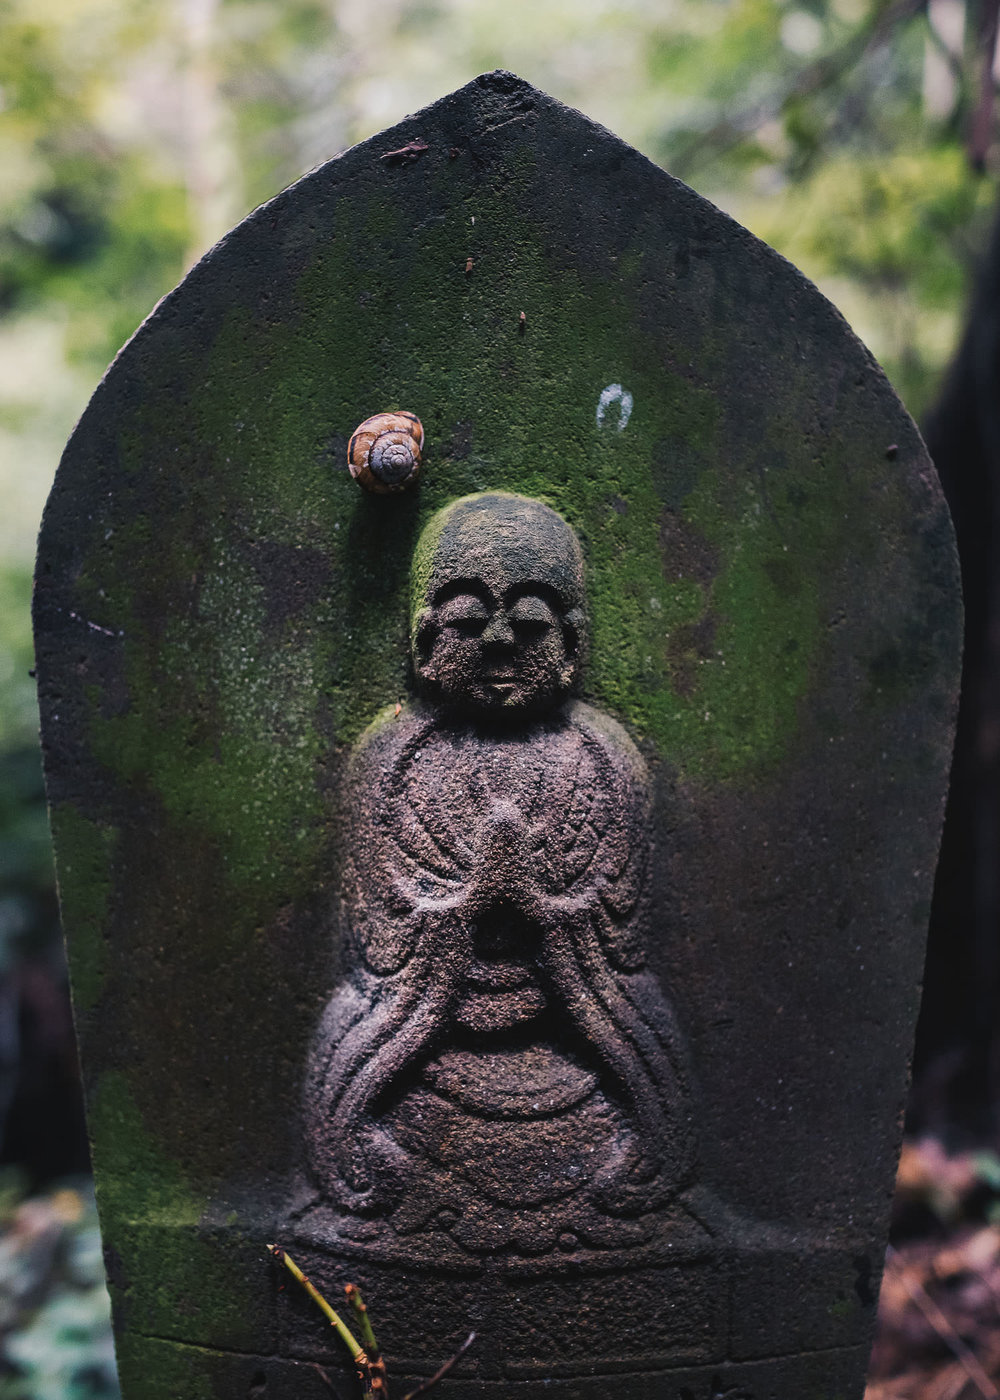 Day 7, Sept 2, 2015: A Sleeping Snail on an Ancient Gravestone at Iyadani-ji, Temple #71, Kagawa